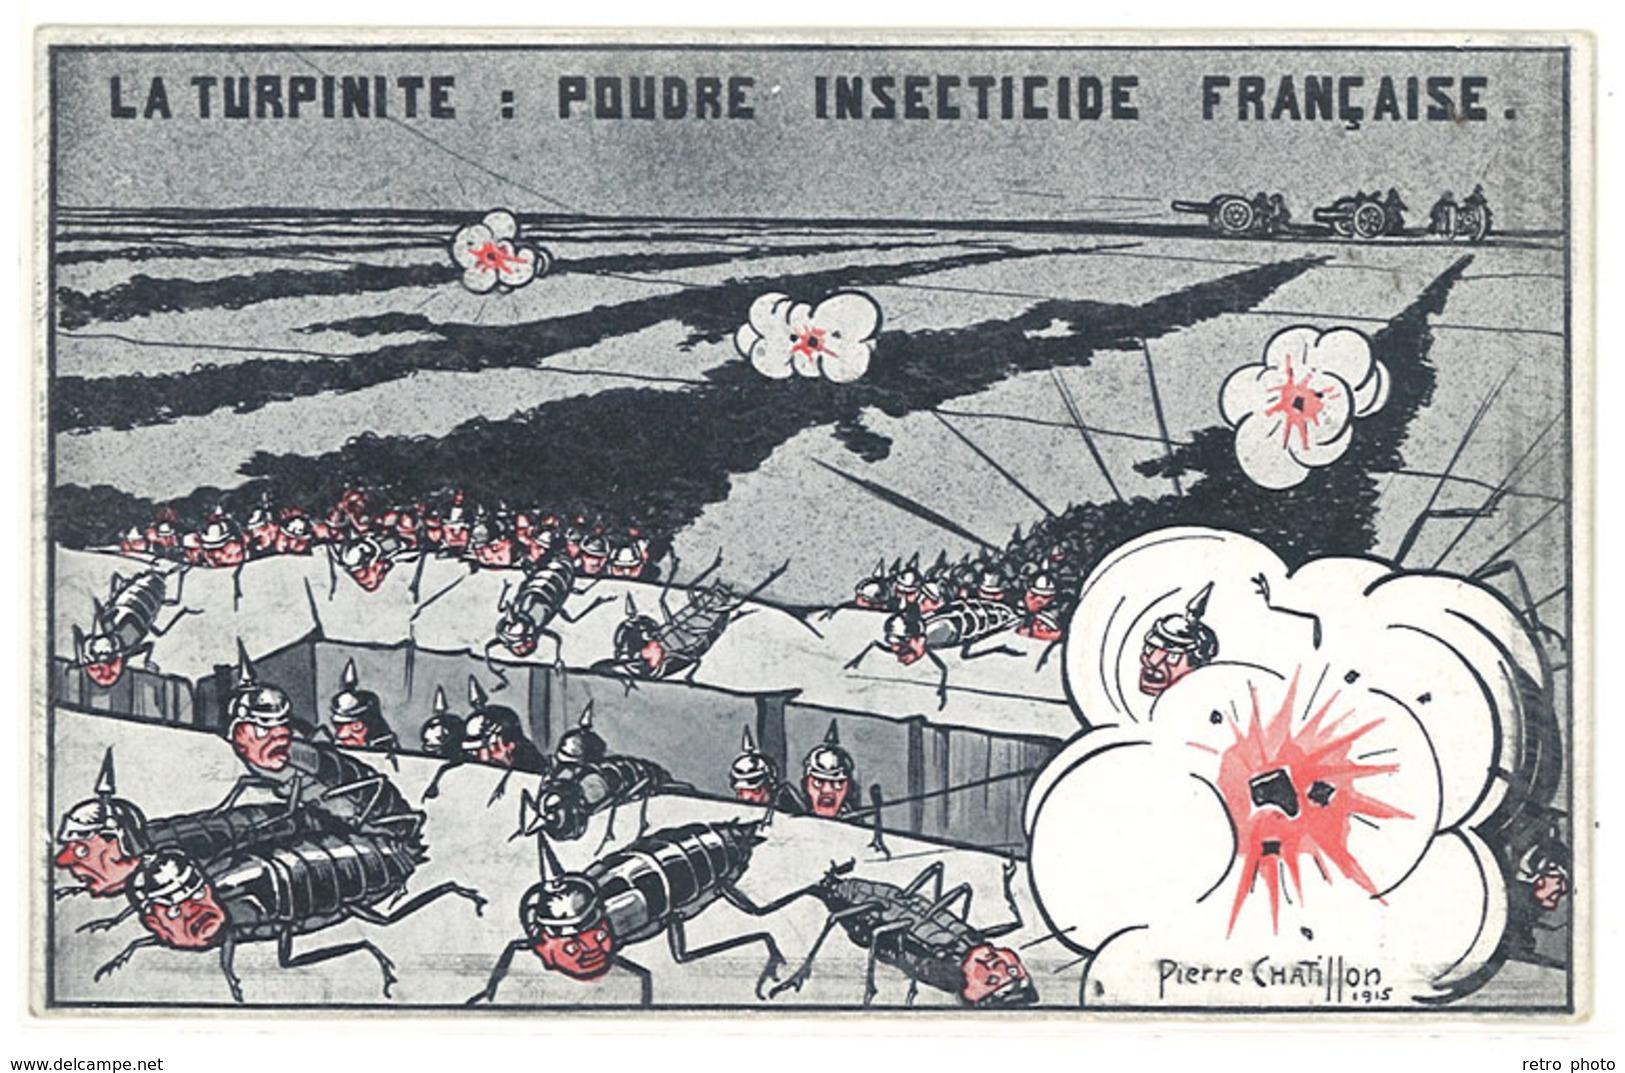 Cpa Signée Chatillon - La Turpinite, Poudre Insecticide Française  ( Anti-allemande / Cafards )   ((S.1162)) - Other Illustrators